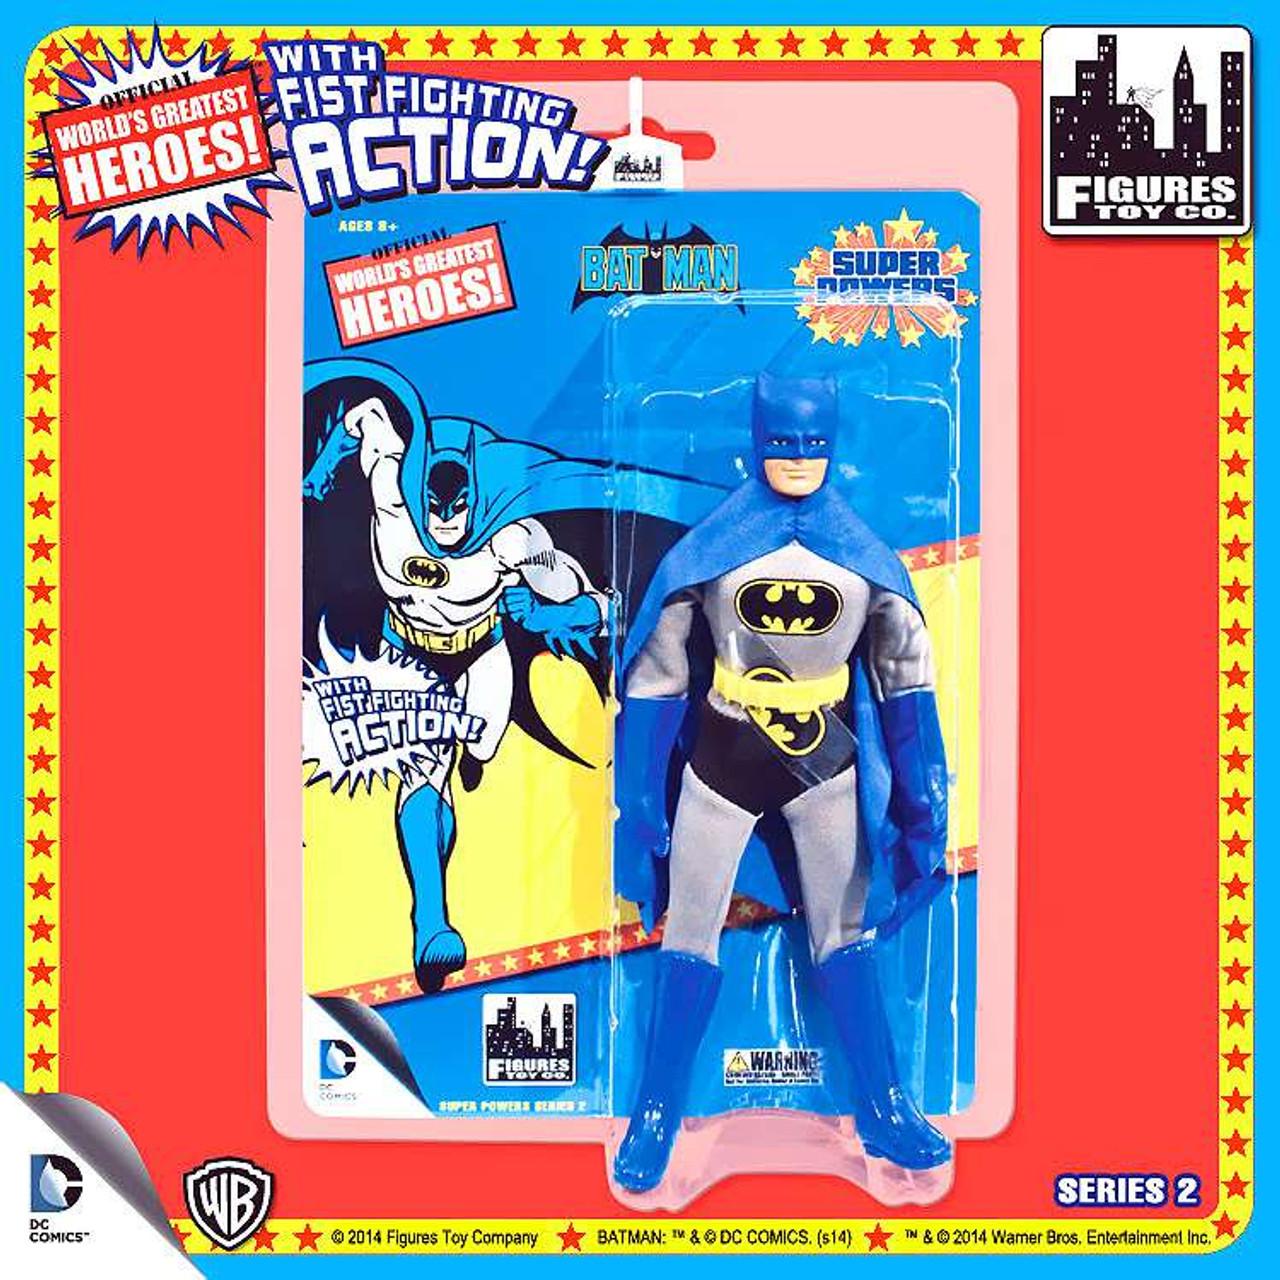 World's Greatest Heroes Super Powers Series 2 Batman Action Figures